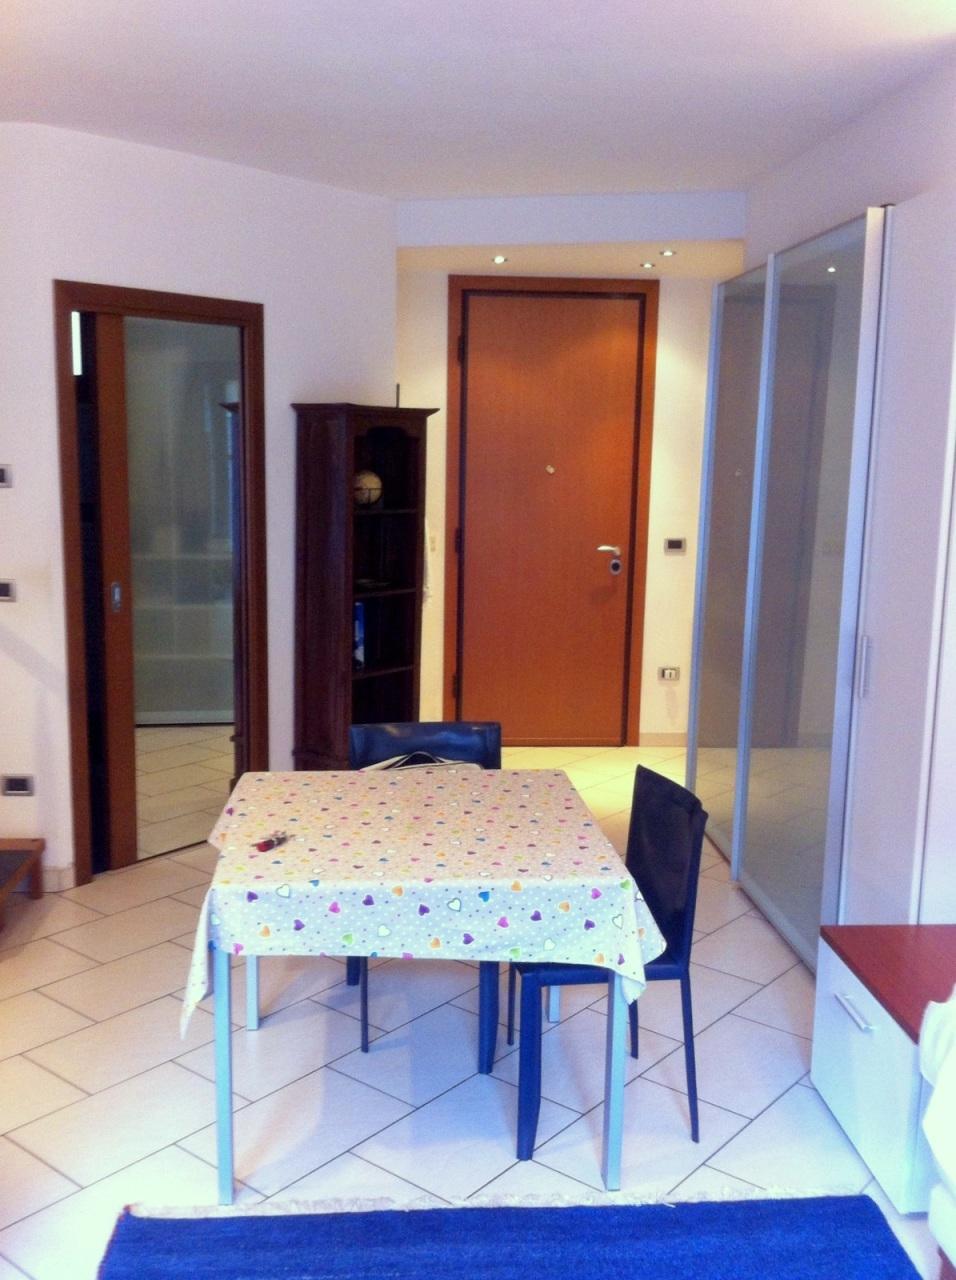 Bilocale Cesena Via Giovanni Antonio Battarra 90 4